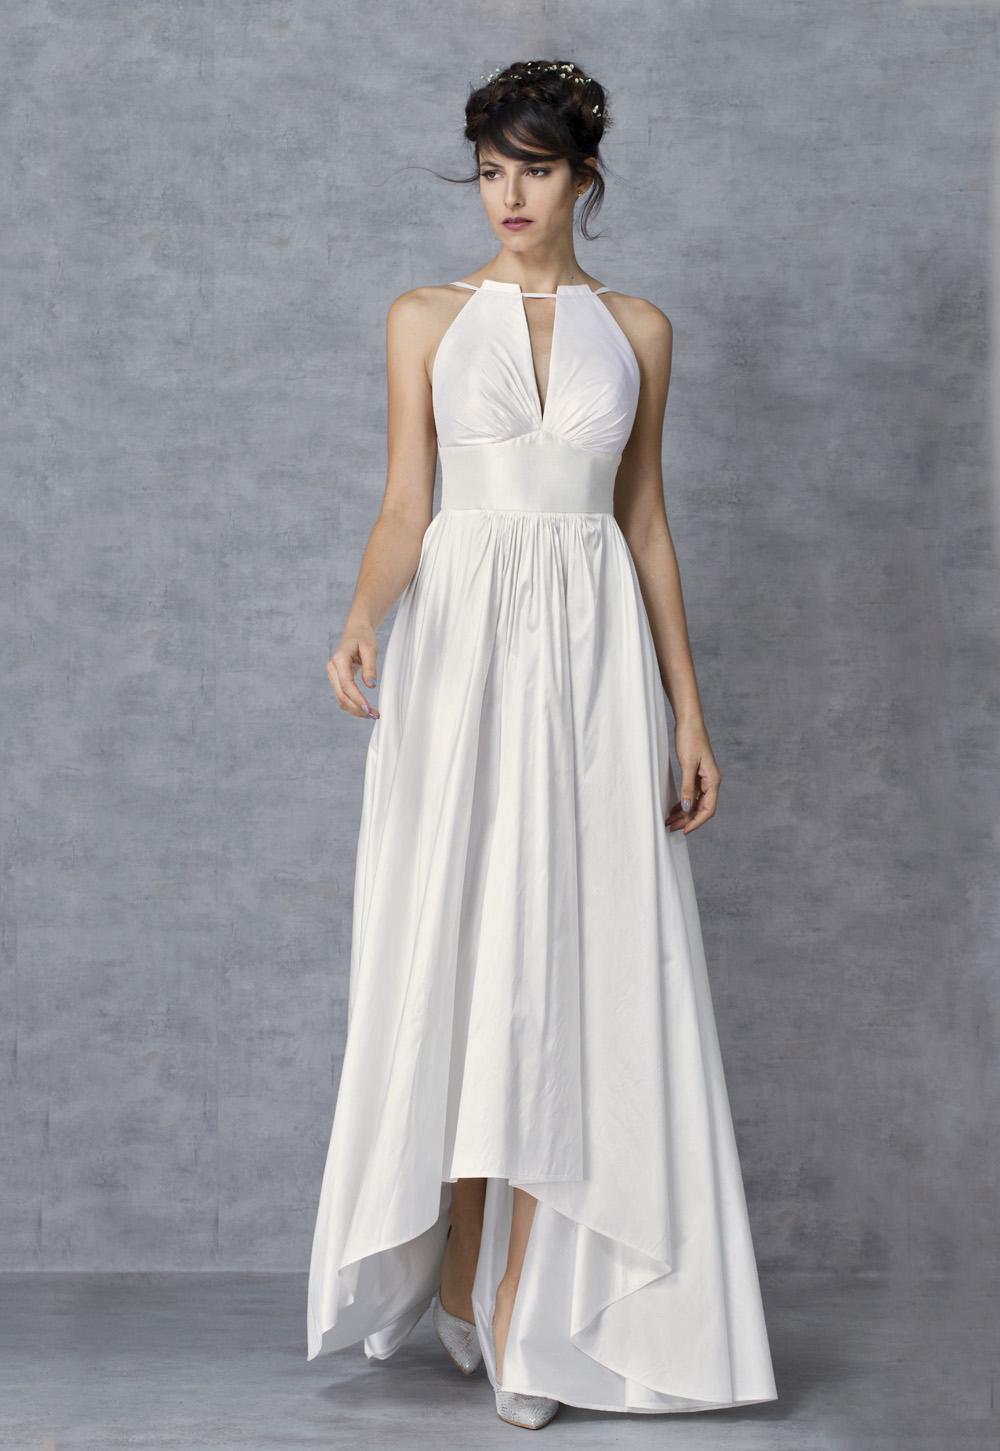 I3A9442 שמלות כלה - שמלה